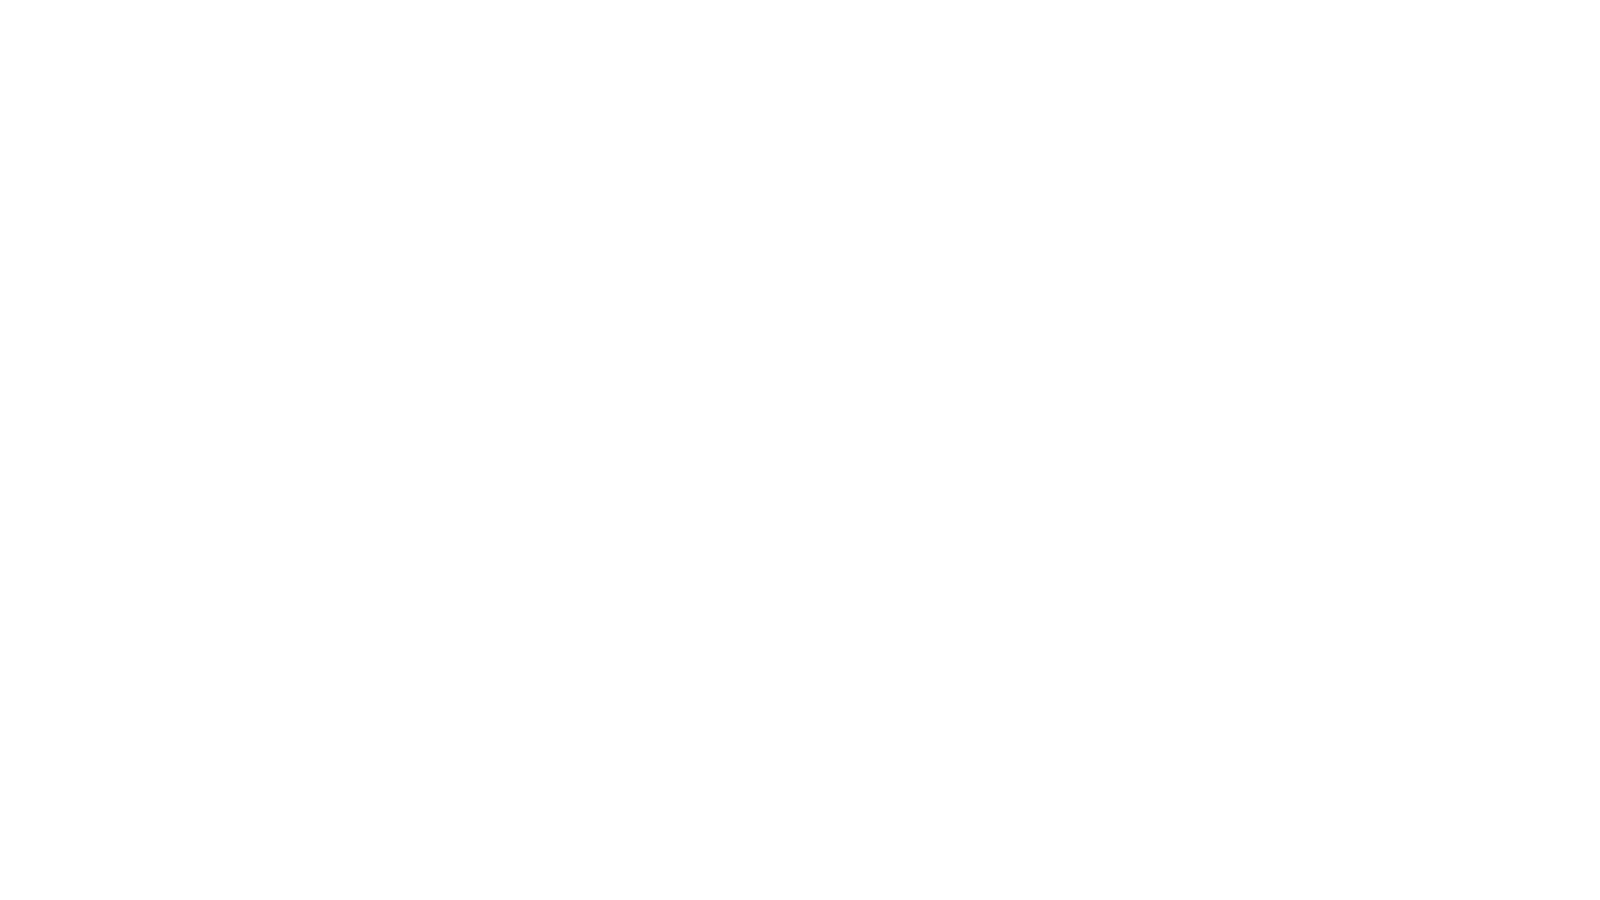 Studentisches Filmprojekt für das Modul Medienproduktion des Studiengangs Media and Communications for Digital Business der FH Aachen. --- Credits ---  Performed by Max Grafenauer, originally performed by Canyon City.  Starring: Ben-Arik Mann & Sophie Ritzenberger Directed by: Julia Valder & Julia Bock Camera: Leon Bataille Sound: Max Grafenauer Storyboard: Julia Bock & Leon Bataille Casting: Julia Valder Costume: Julia Valder